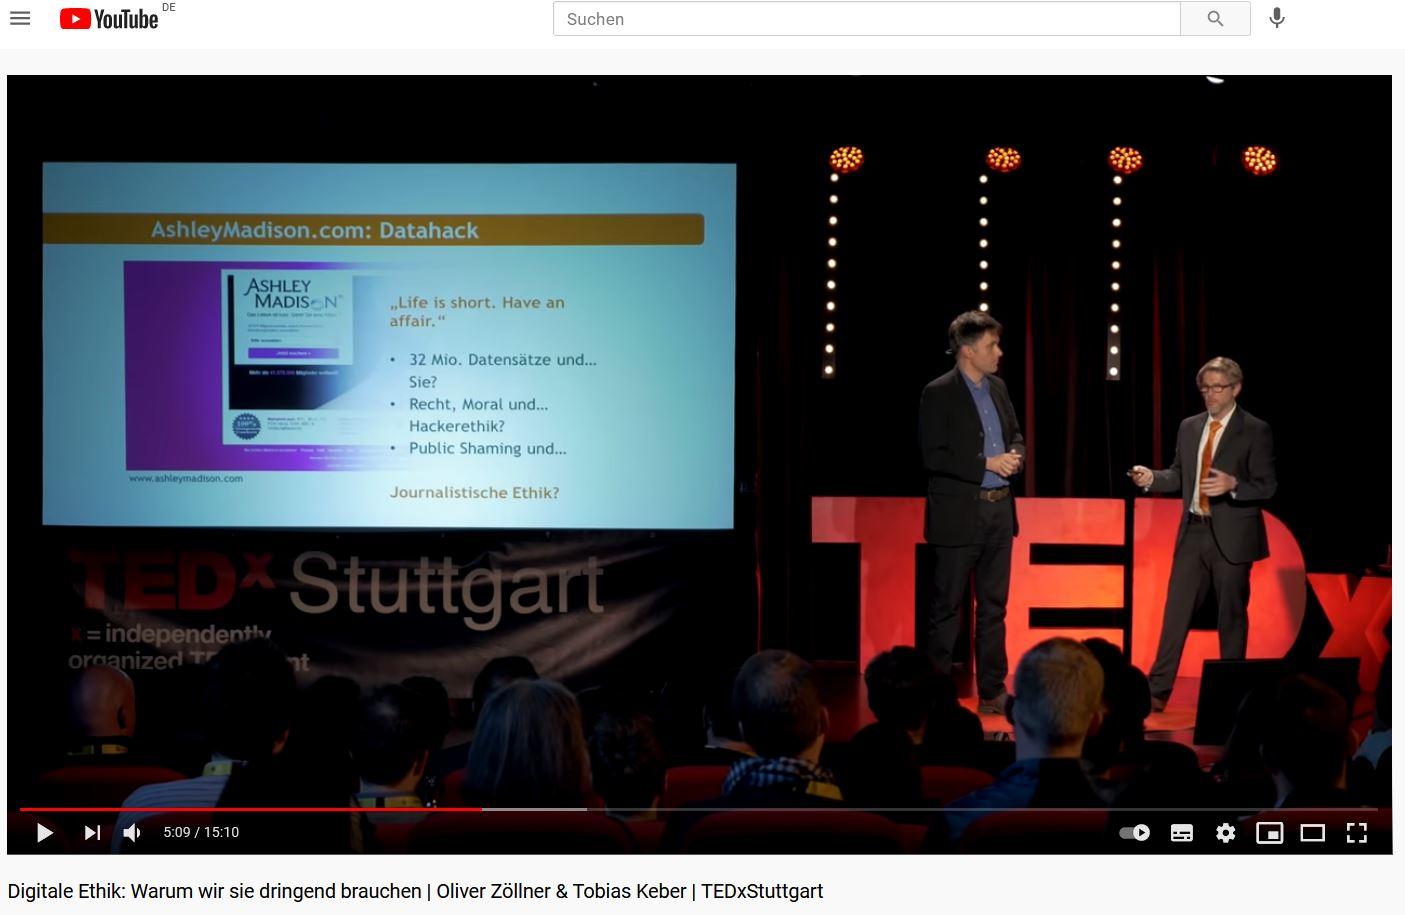 Video bei YouTube TEDx Stuttgart